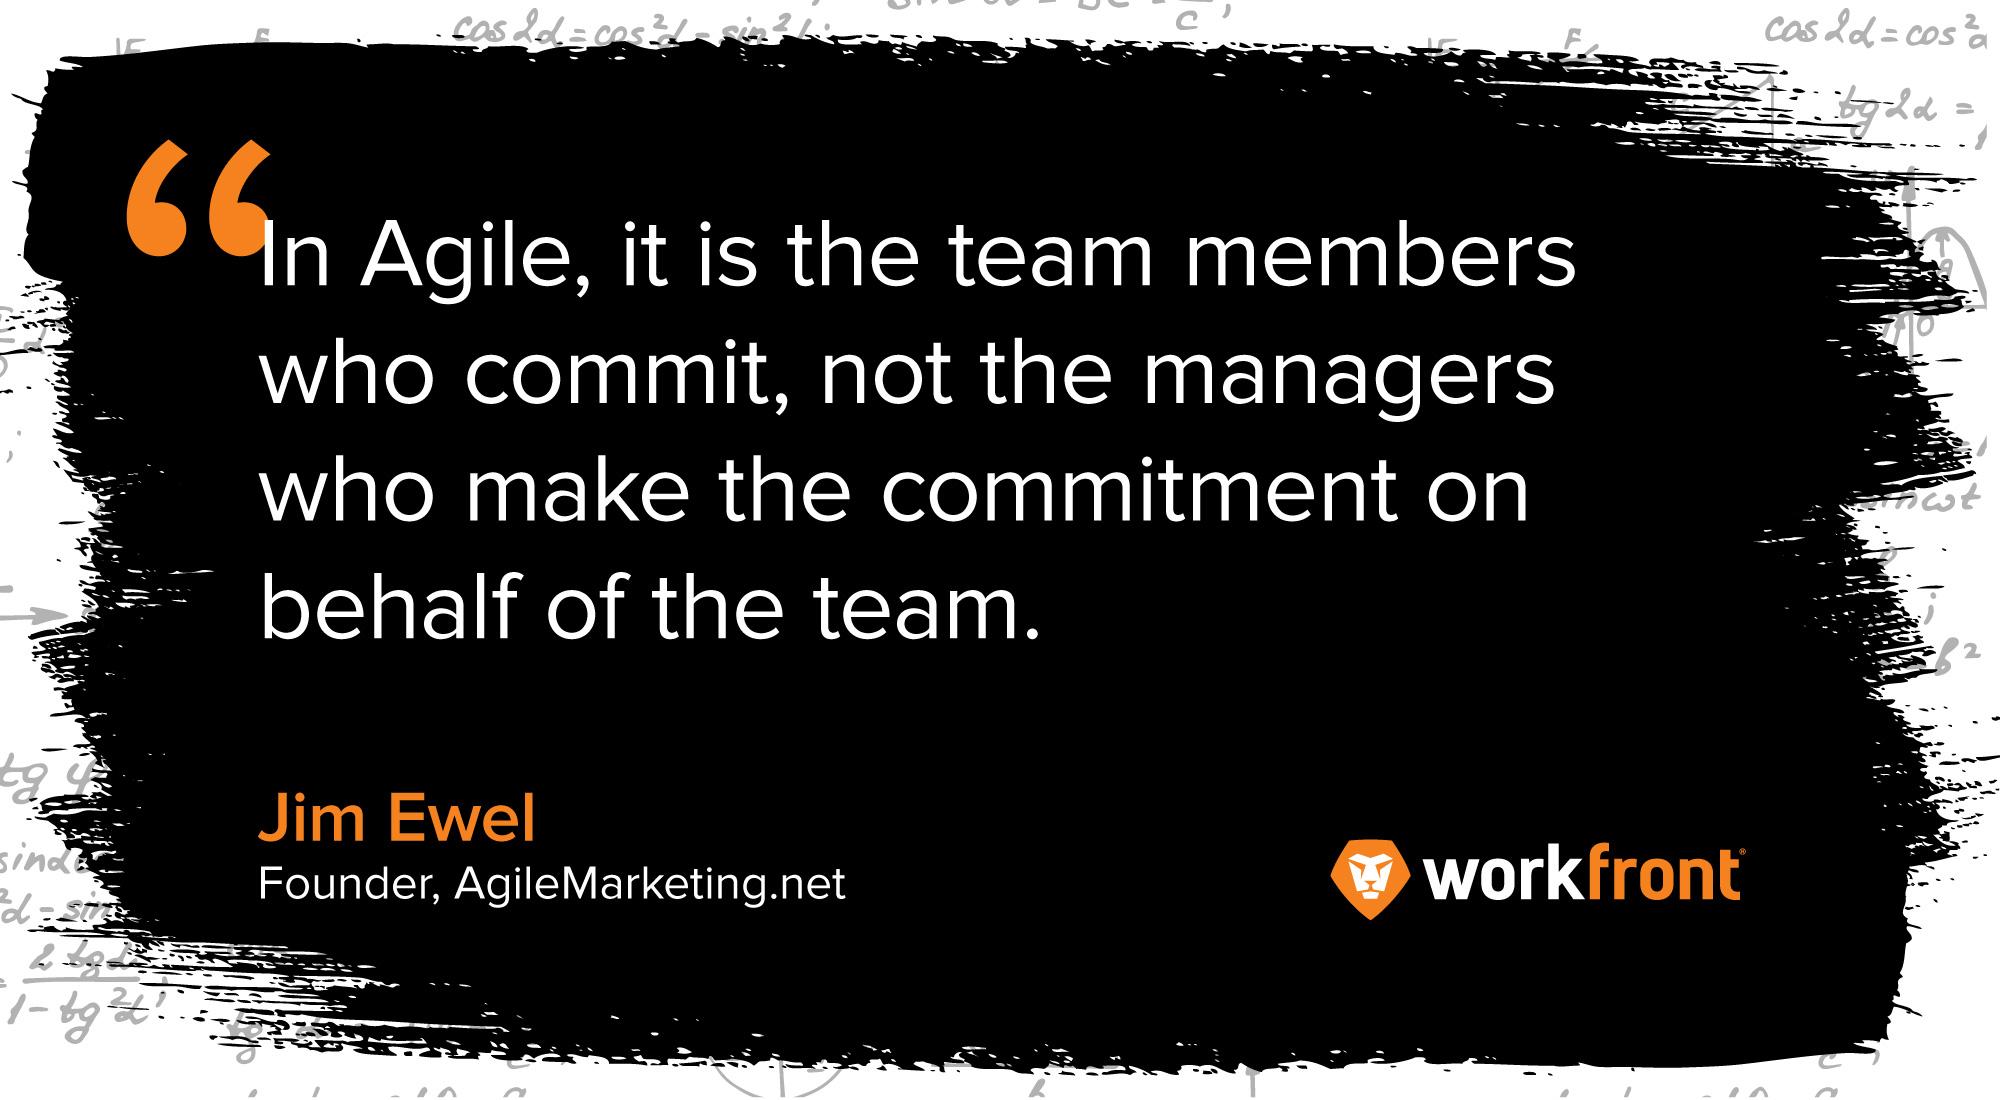 agile marketing quote jim ewel